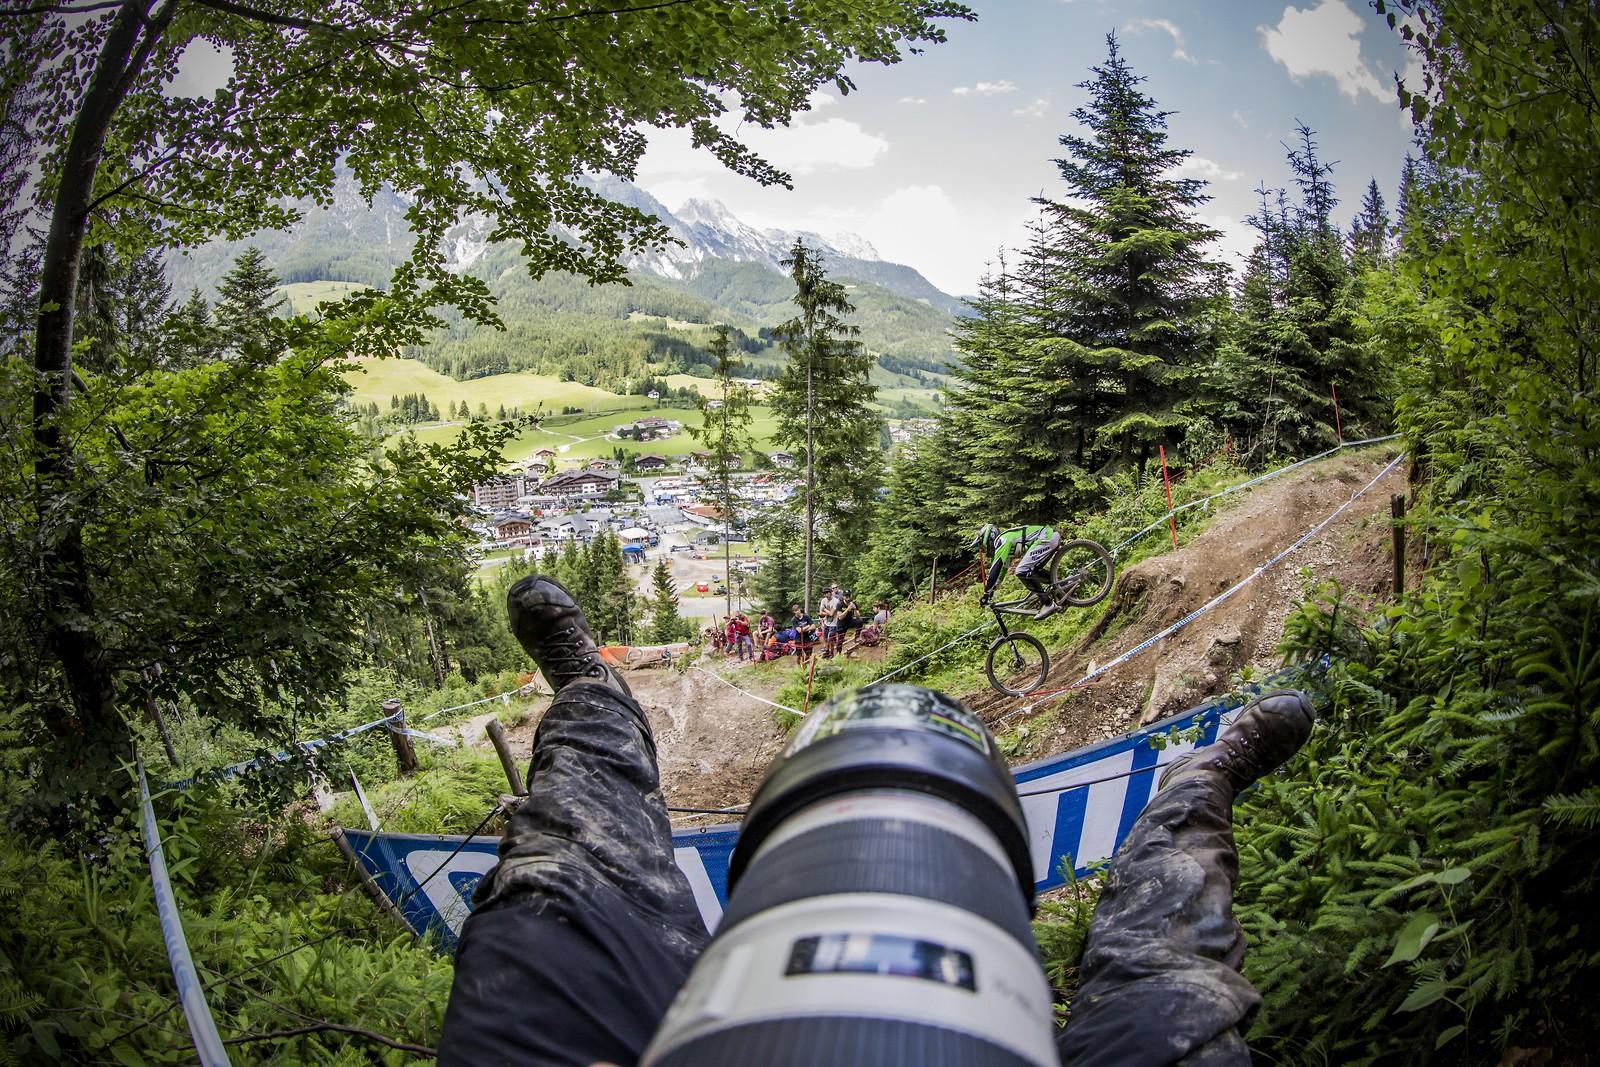 adam bariton leogang wc and my legs ha ha - phunkt.com - Mountain Biking Pictures - Vital MTB